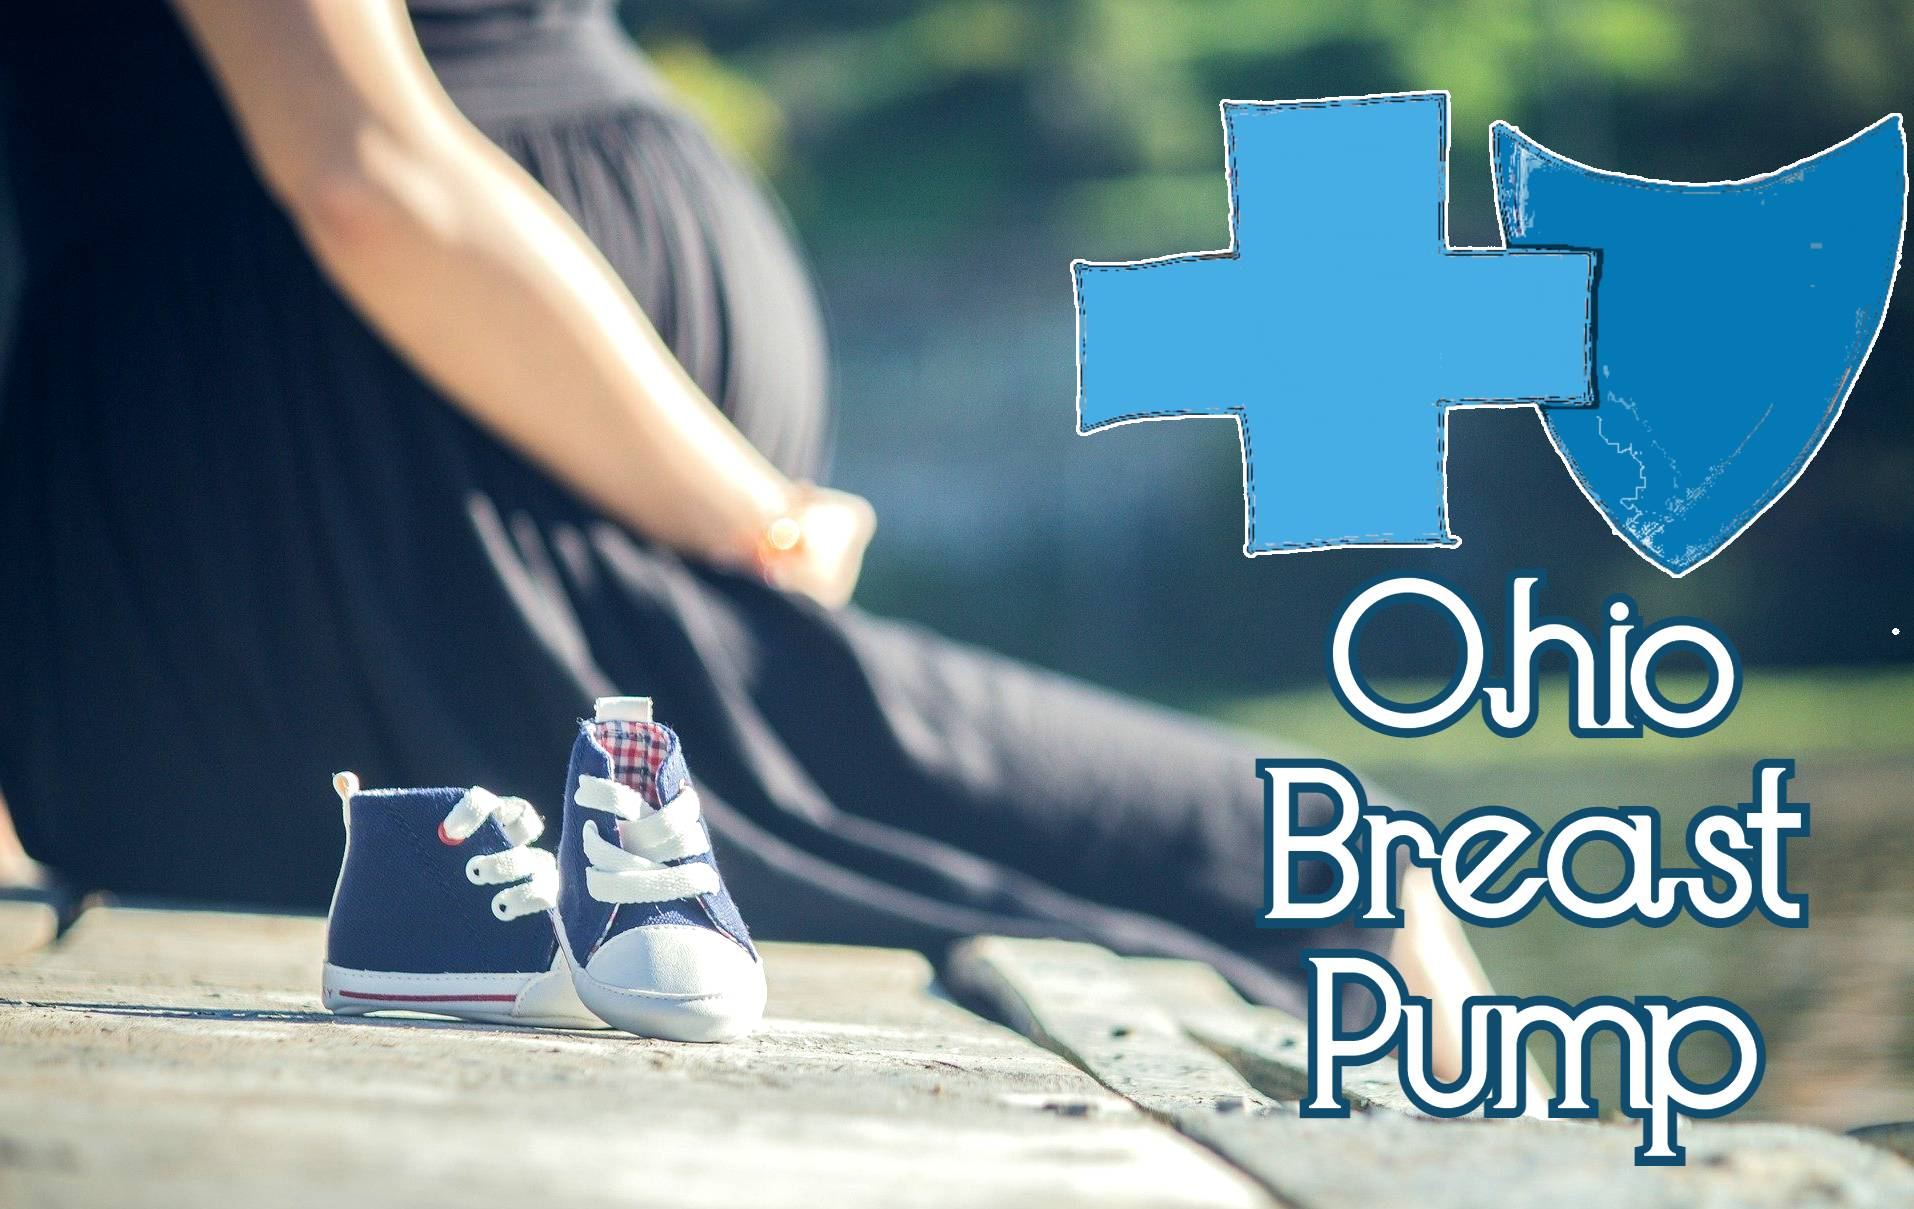 Anthem Blue Cross Breast Pump Ohio